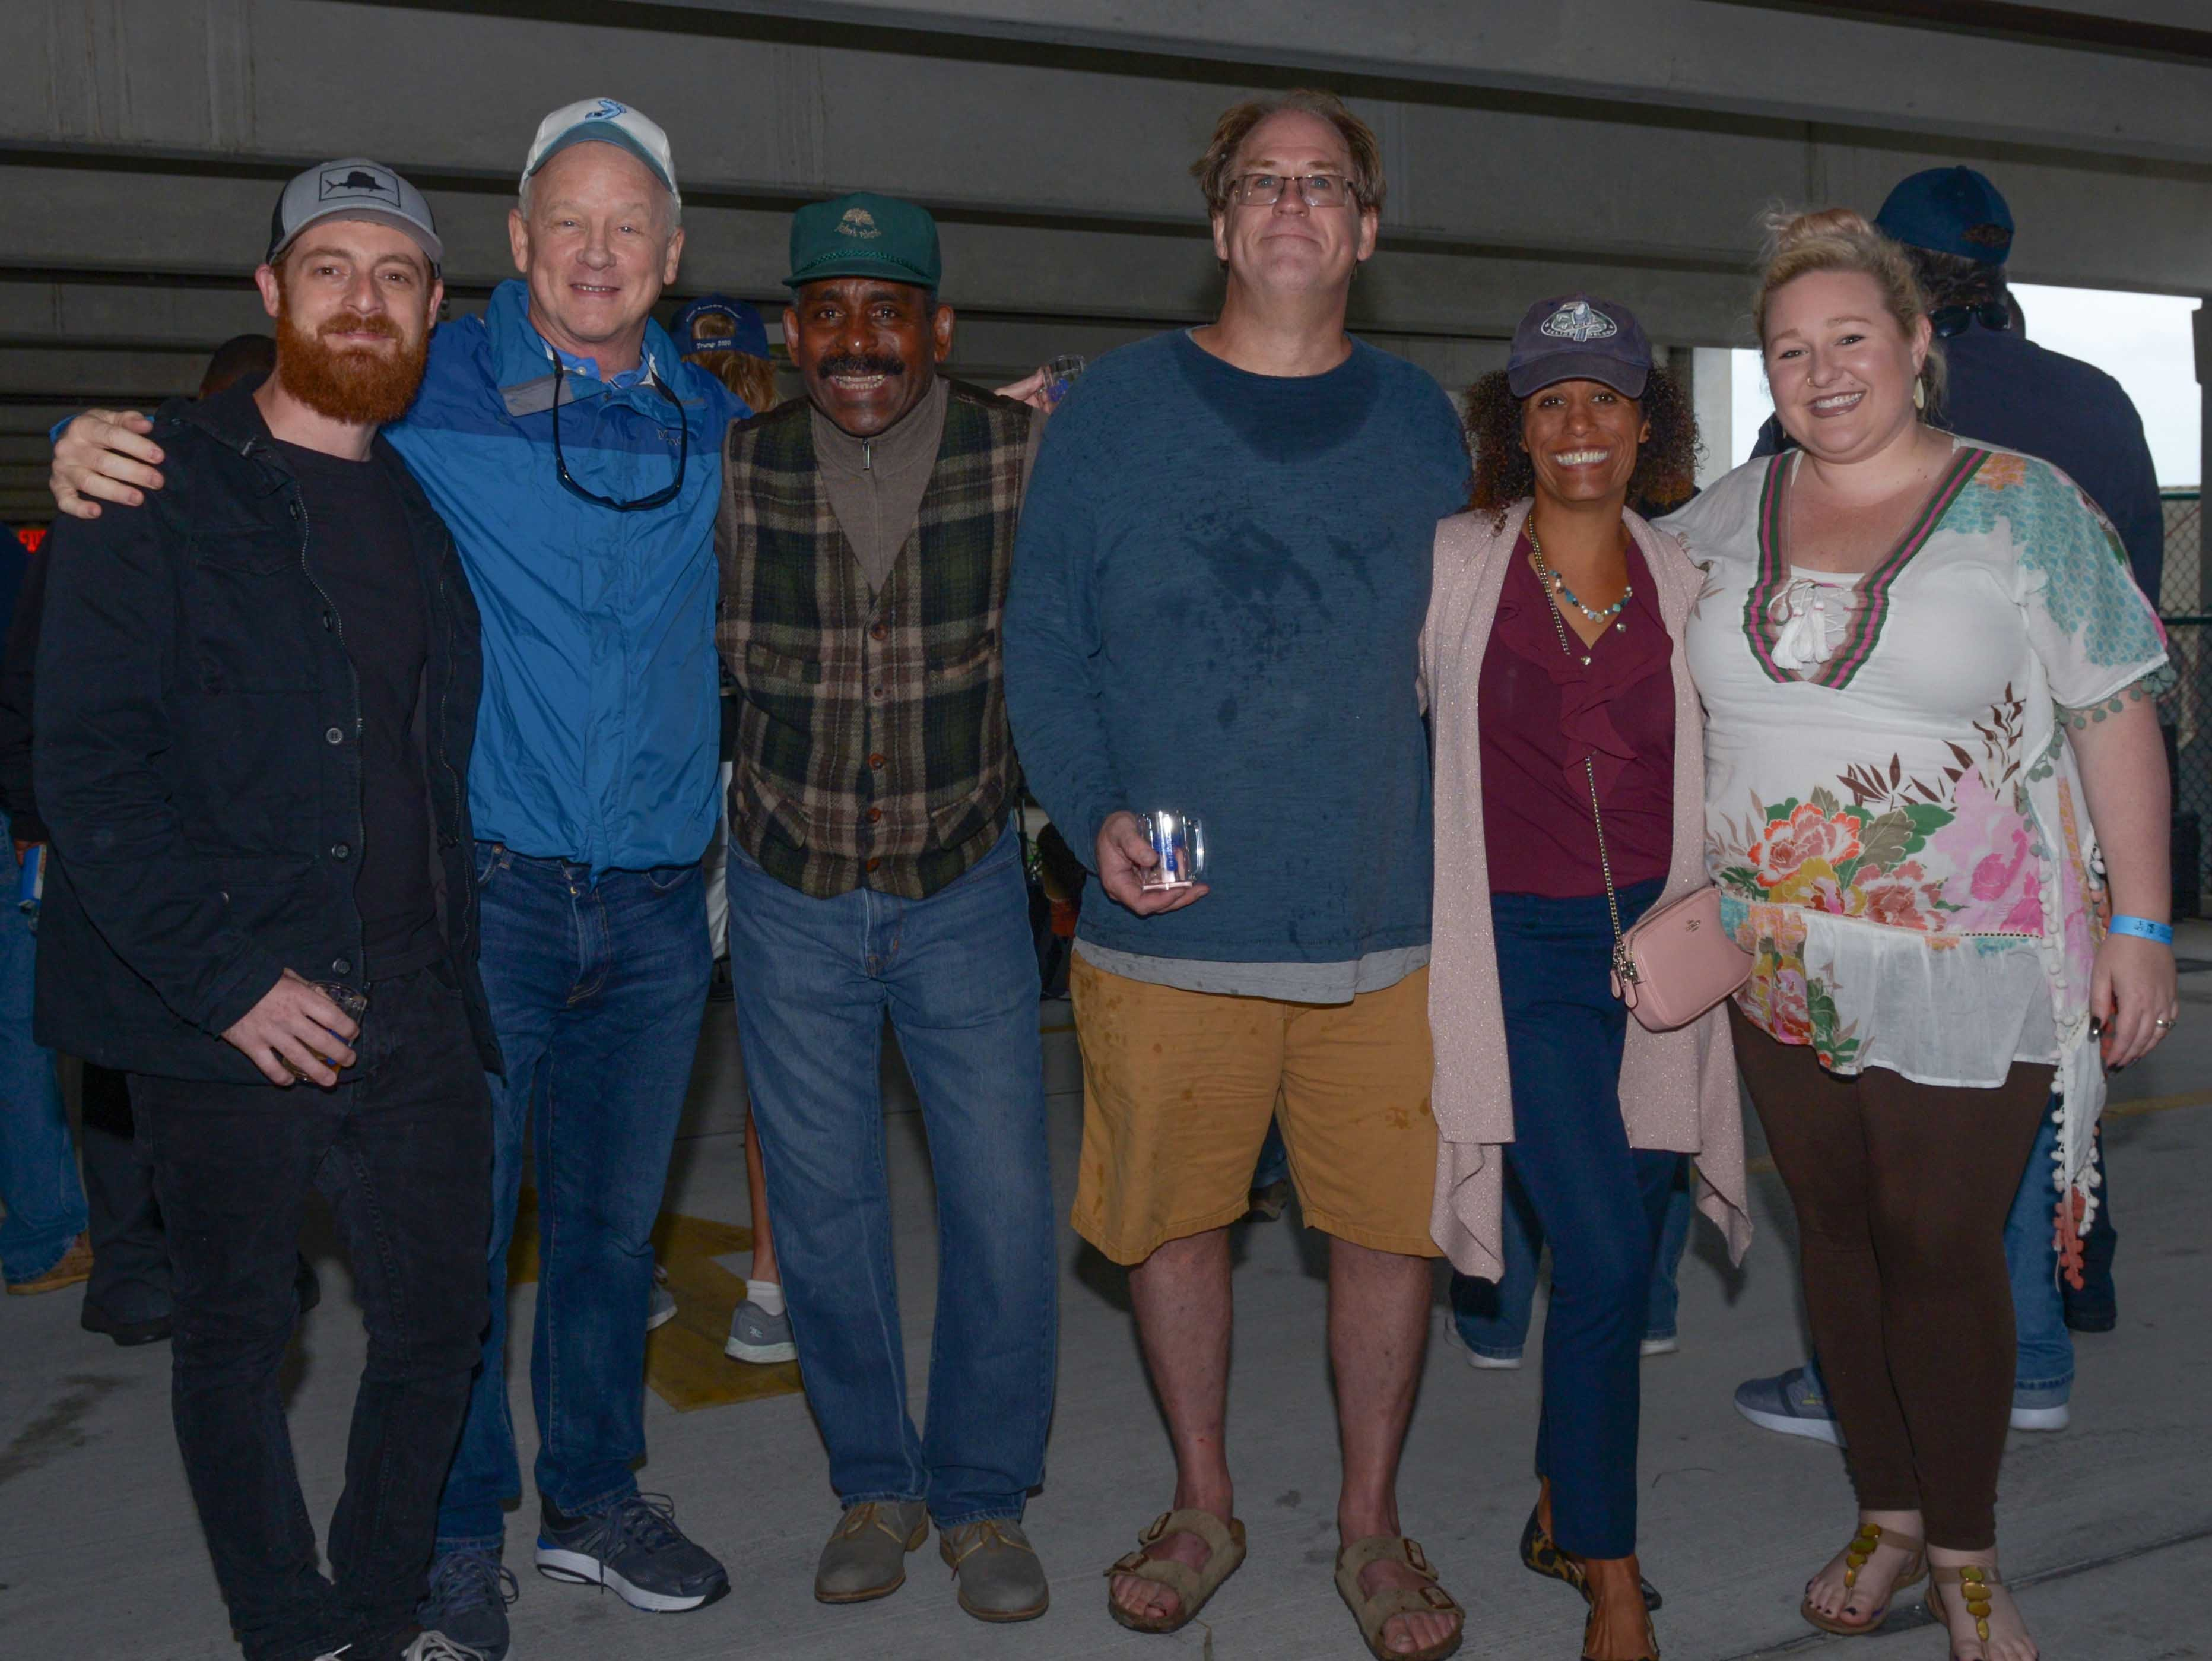 Bluebird Educational Foundation Board members, from left, Zack Jones, Chuck Shafer, Founder Darryl Bey, Bryan Welling, Sunny Booker and Marina Forbus at the Bluebird Educational Foundation's Groovin' & Tastin' Sunrise City Wine & Spirits Fest.